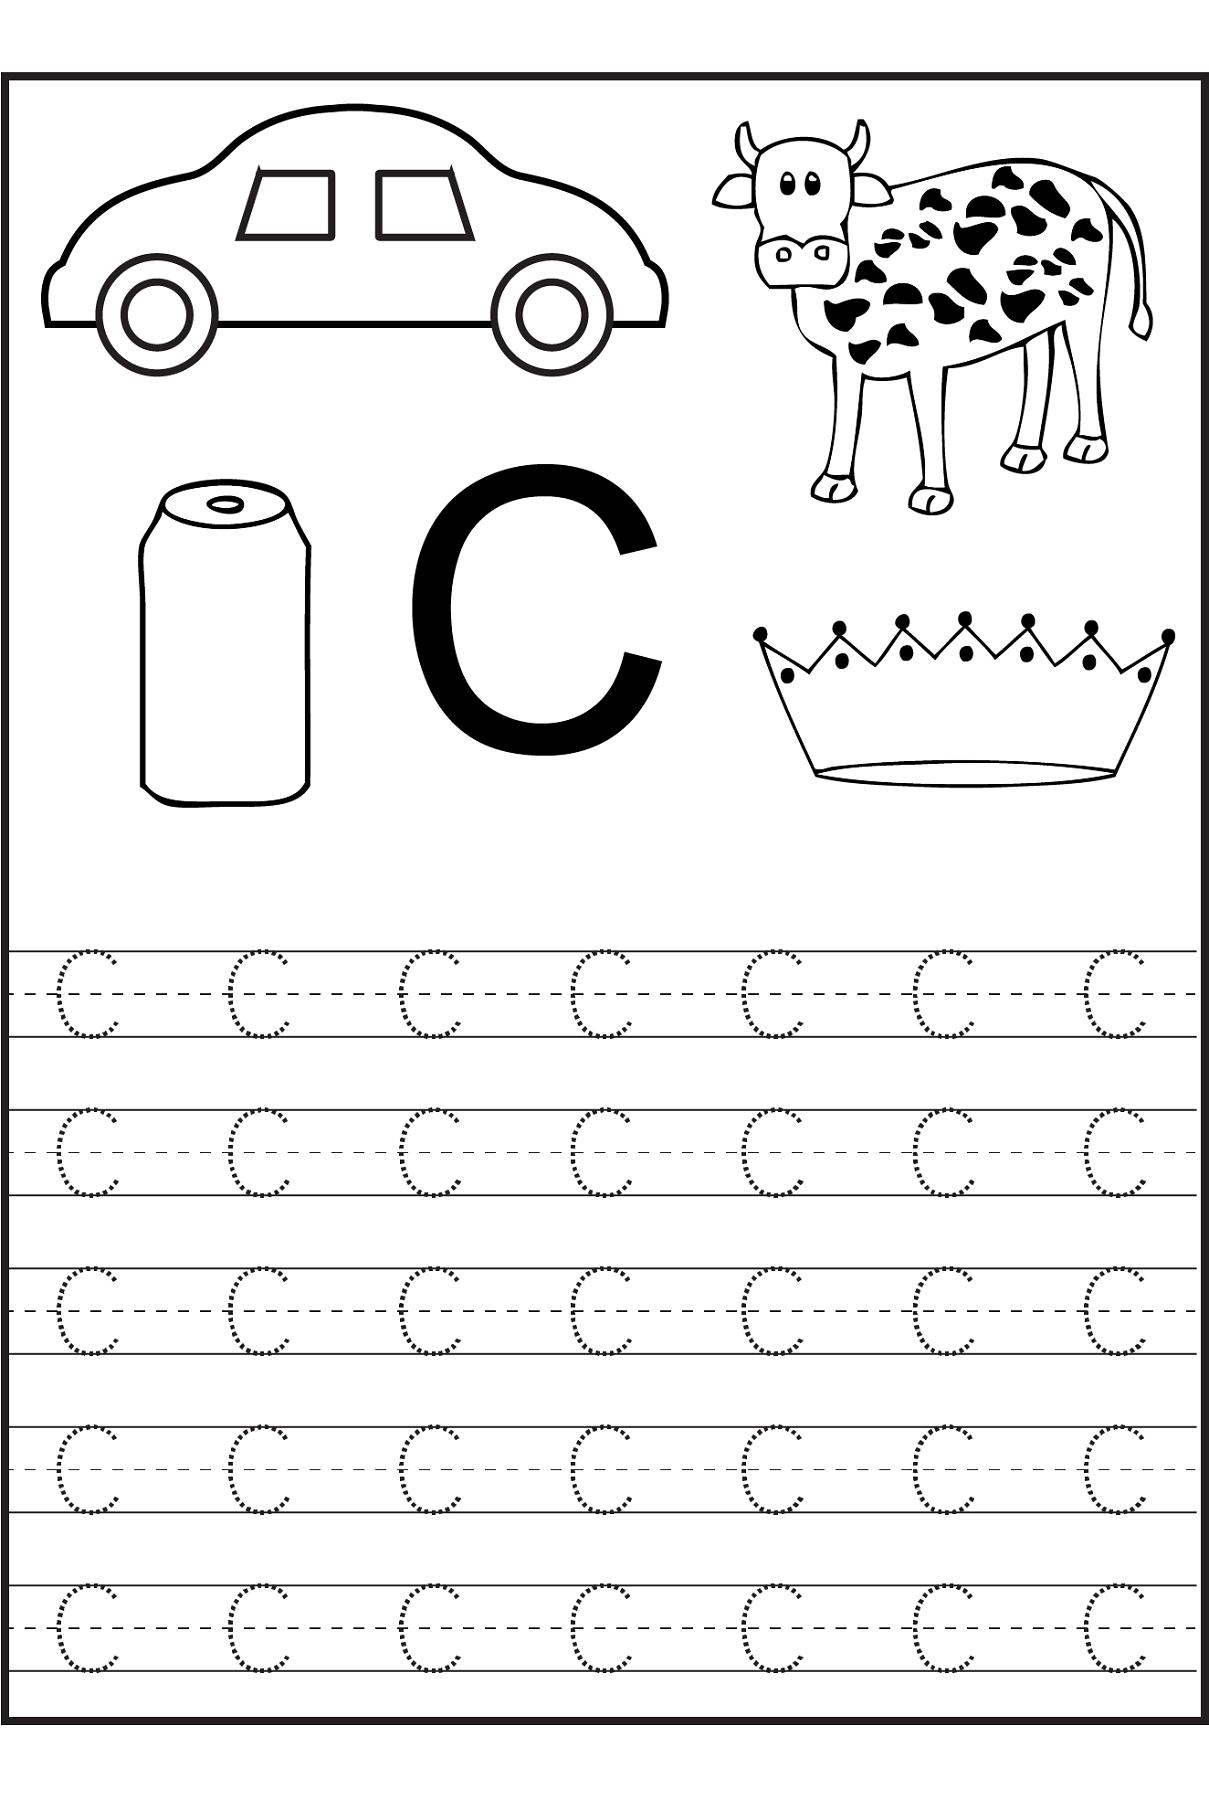 Trace The Letter C Worksheets Preschool Worksheets, Letter C regarding Letter C Worksheets For Preschool Pdf